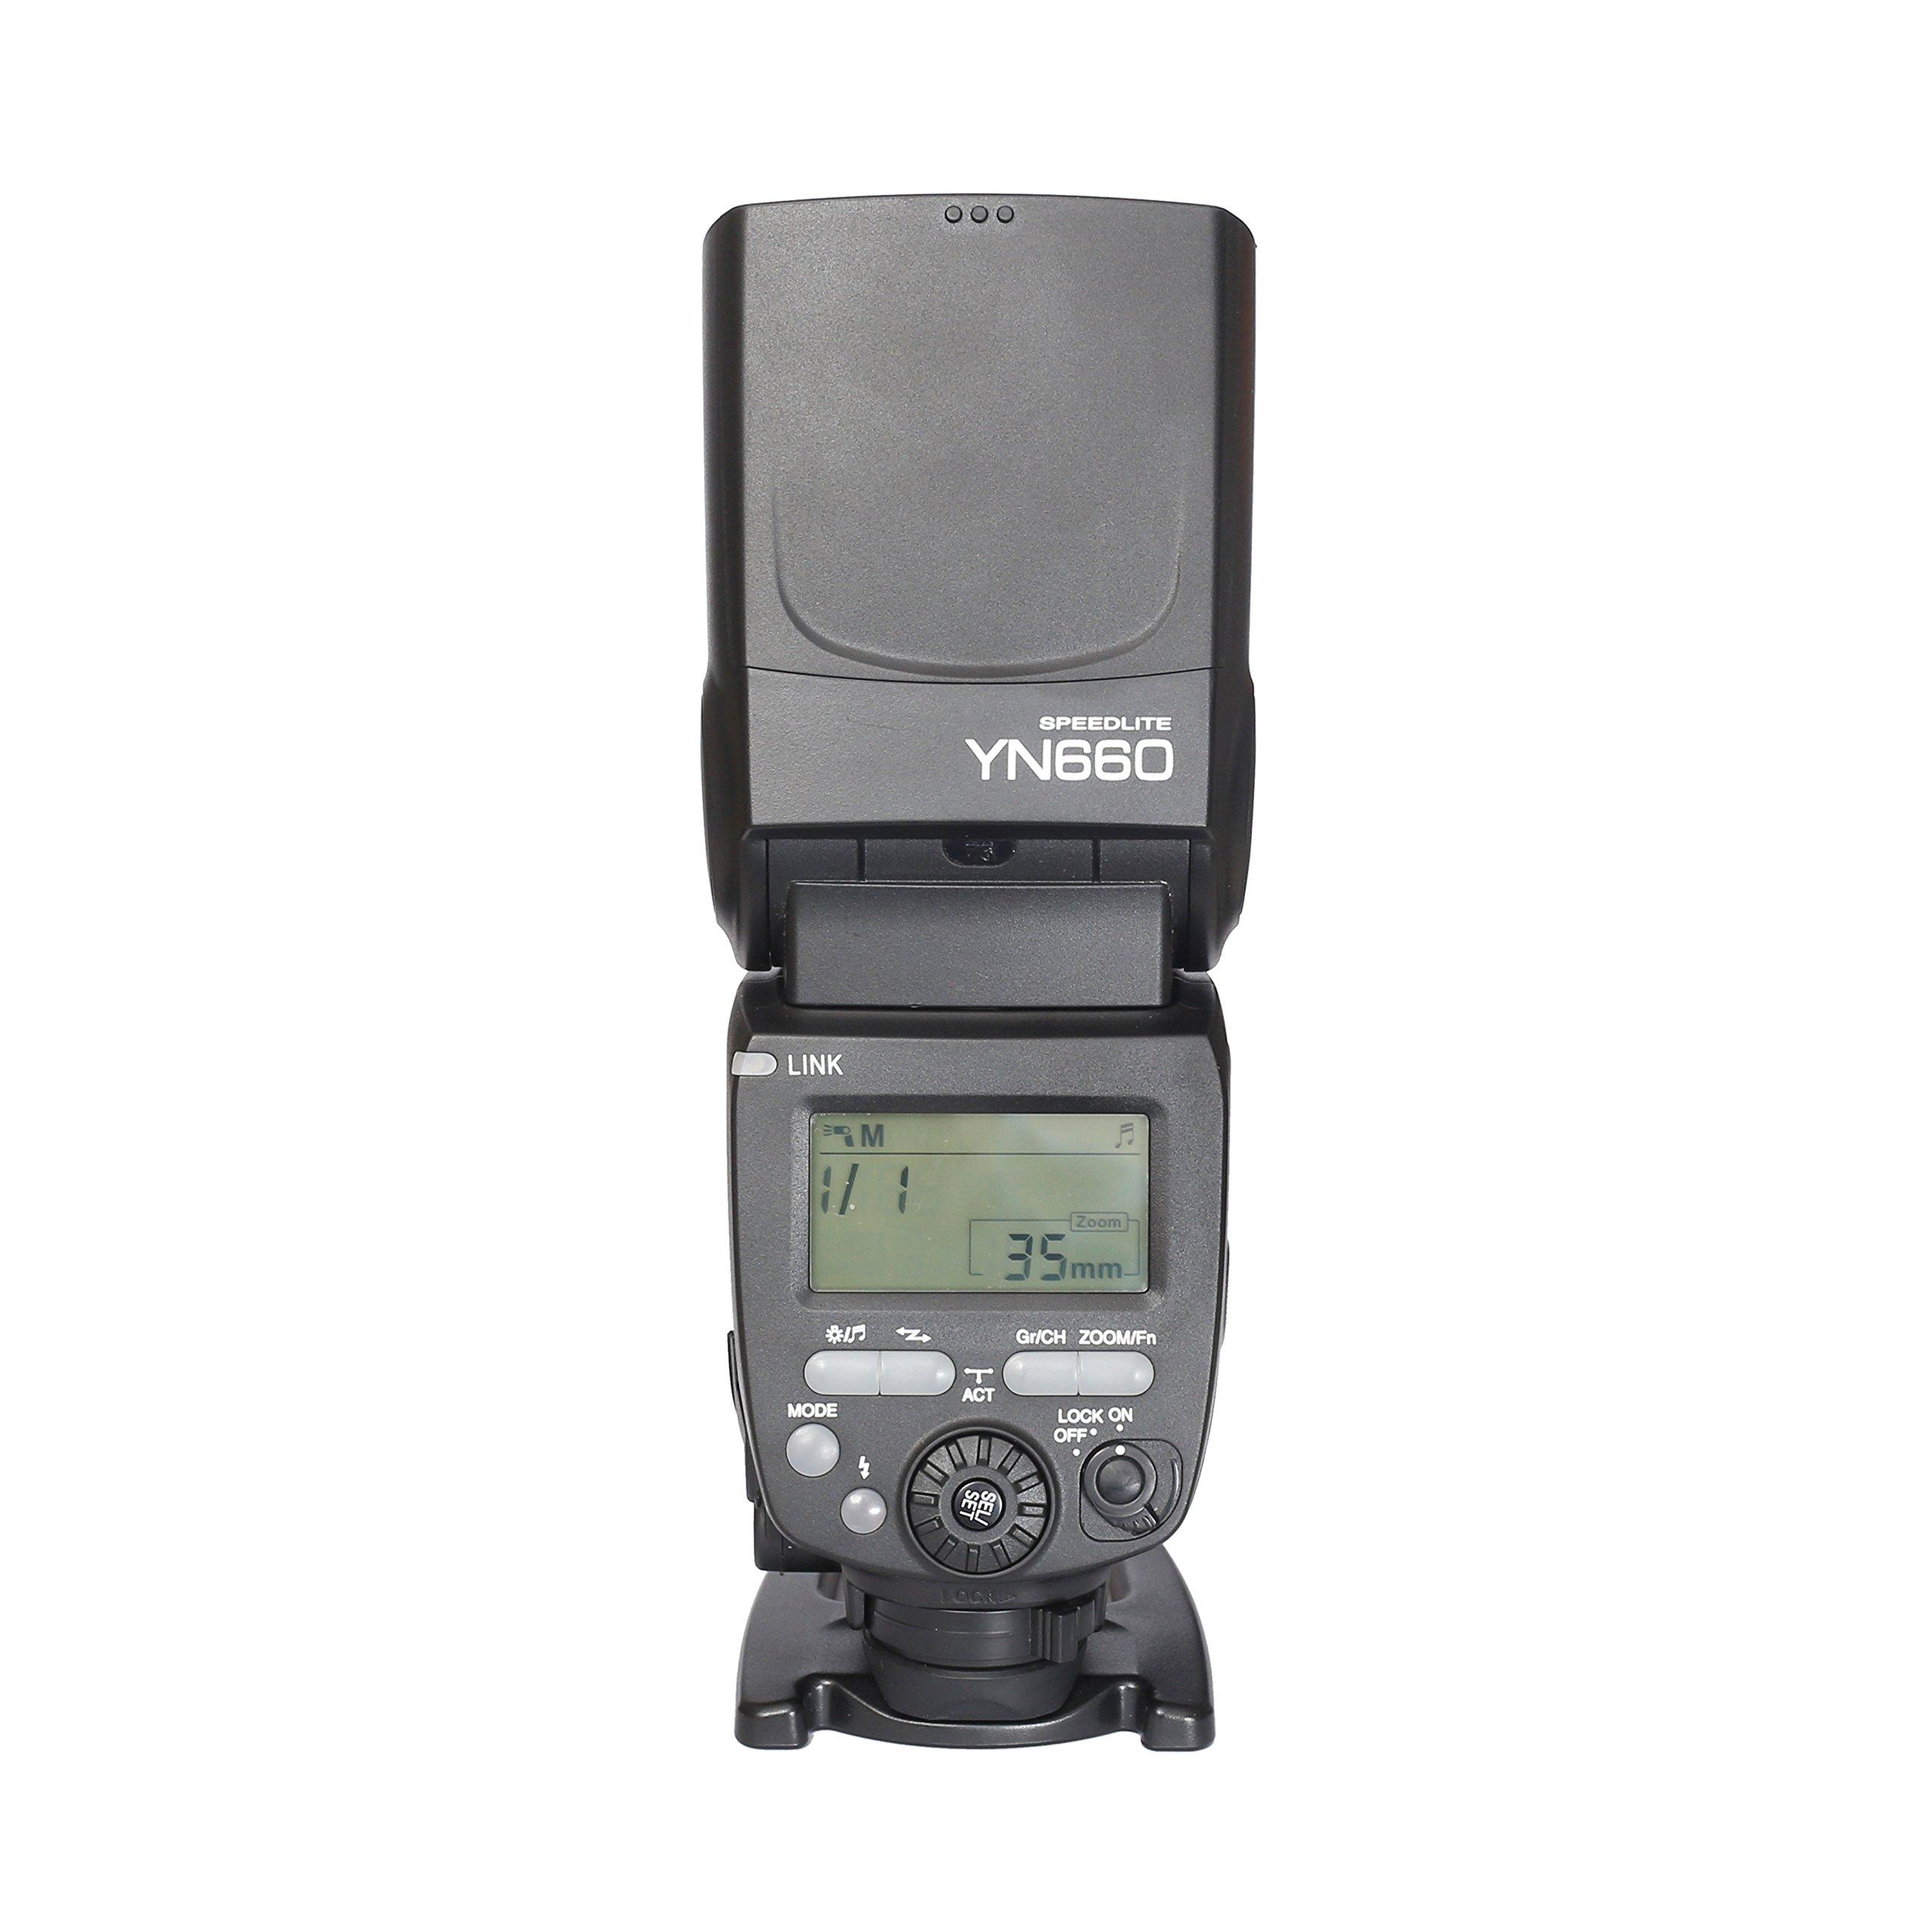 YONGNUO YN660 Wireless Manual Flash Speedlite GN66 2.4G Wireless Radio Master+ Slave Canon Nikon Pentax Olympus